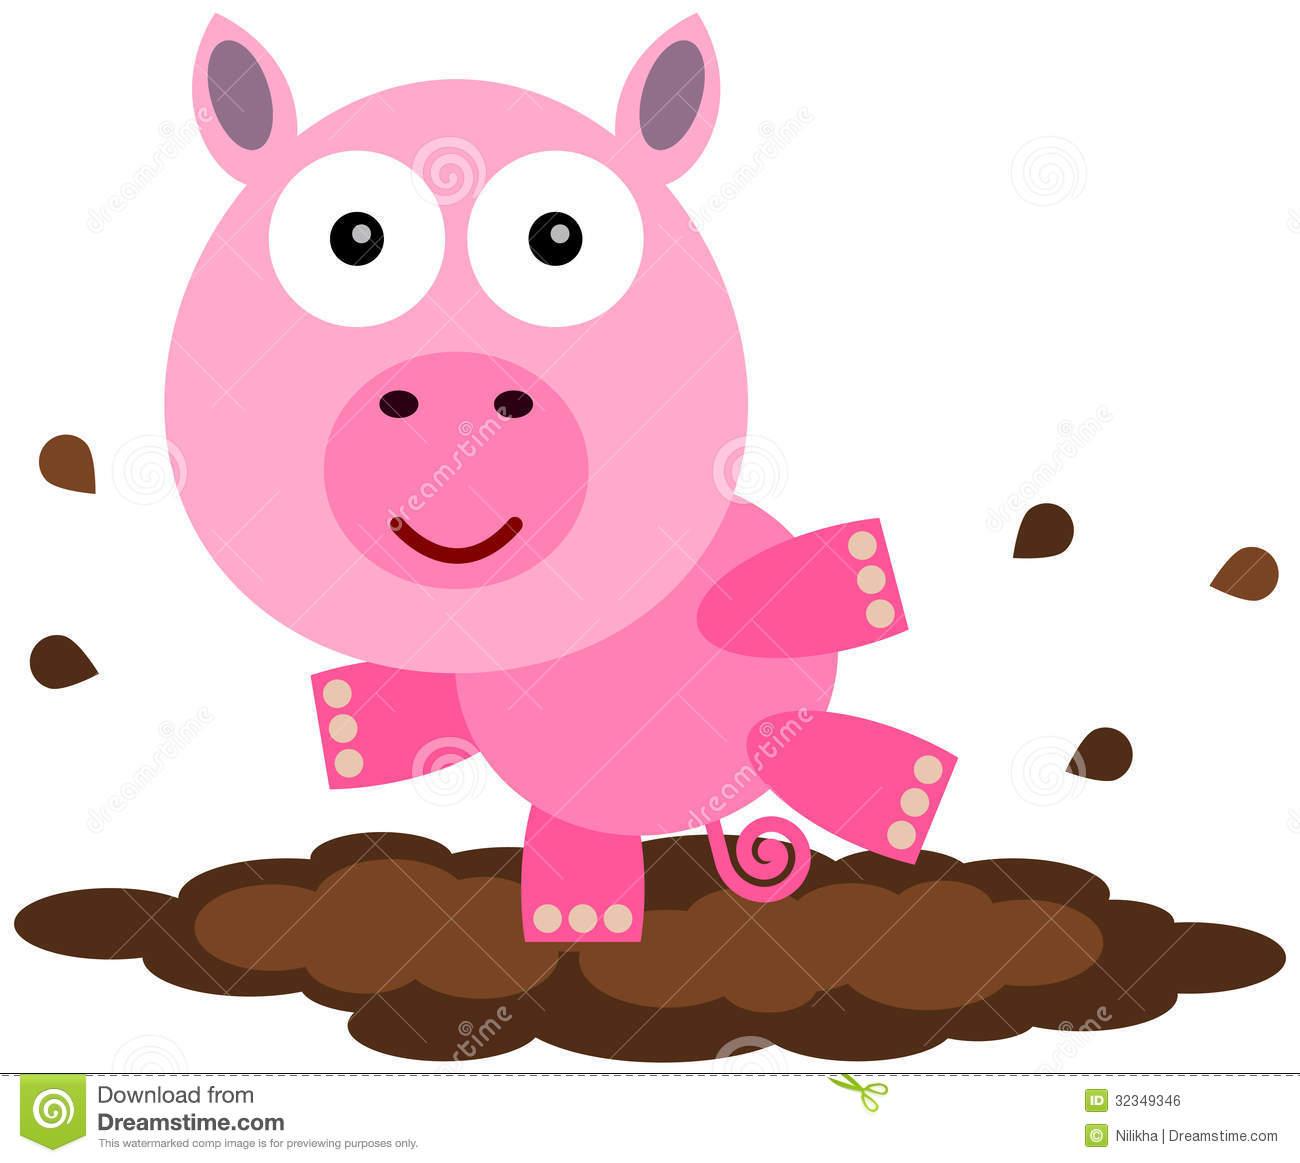 Mud clipart cool pig. X free clip art